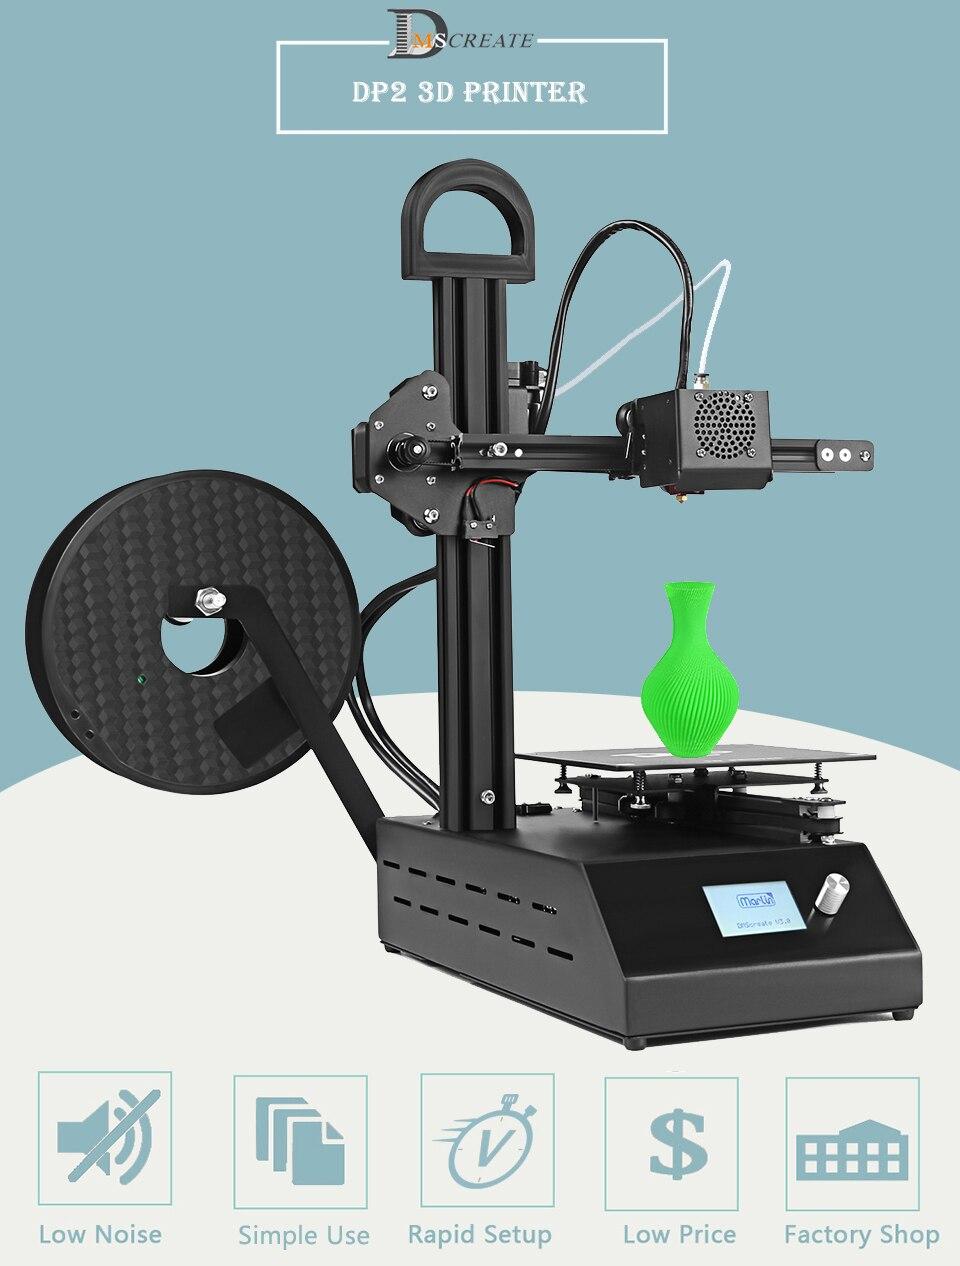 dp2 3d printer-1